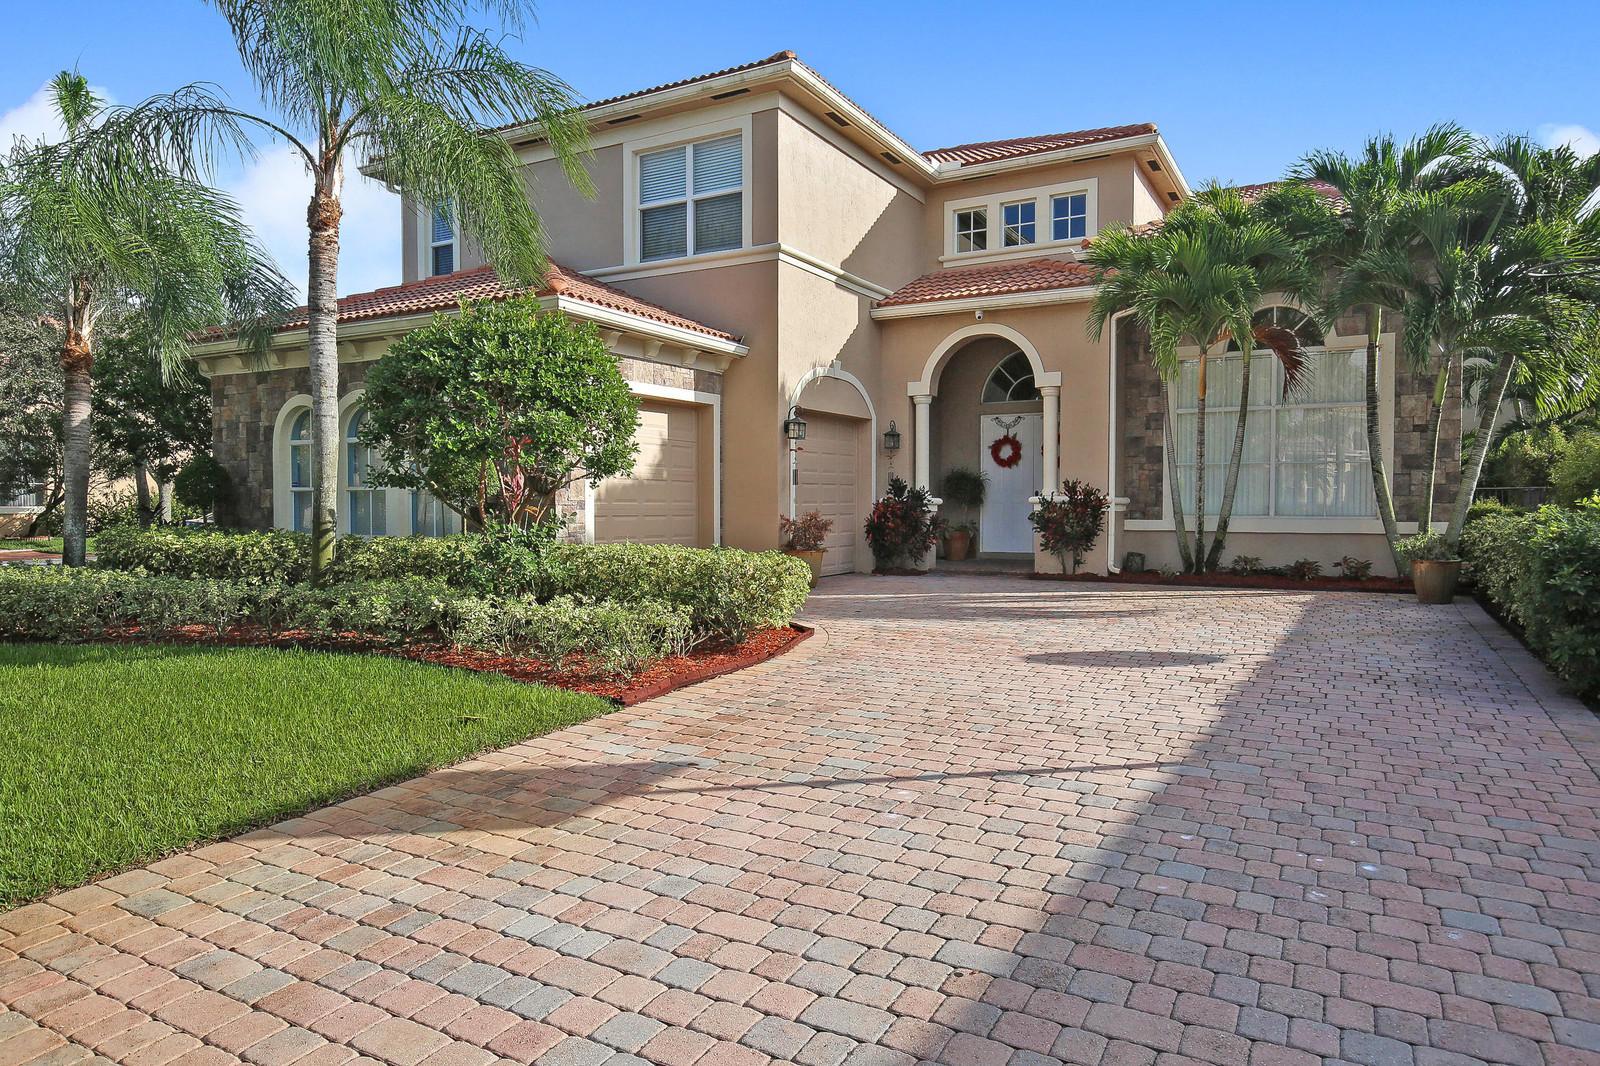 8697 Cobblestone Point Circle, Boynton Beach, Florida 33472, 5 Bedrooms Bedrooms, ,3 BathroomsBathrooms,Single Family,For Sale,Cobblestone Creek,Cobblestone Point,RX-10516927